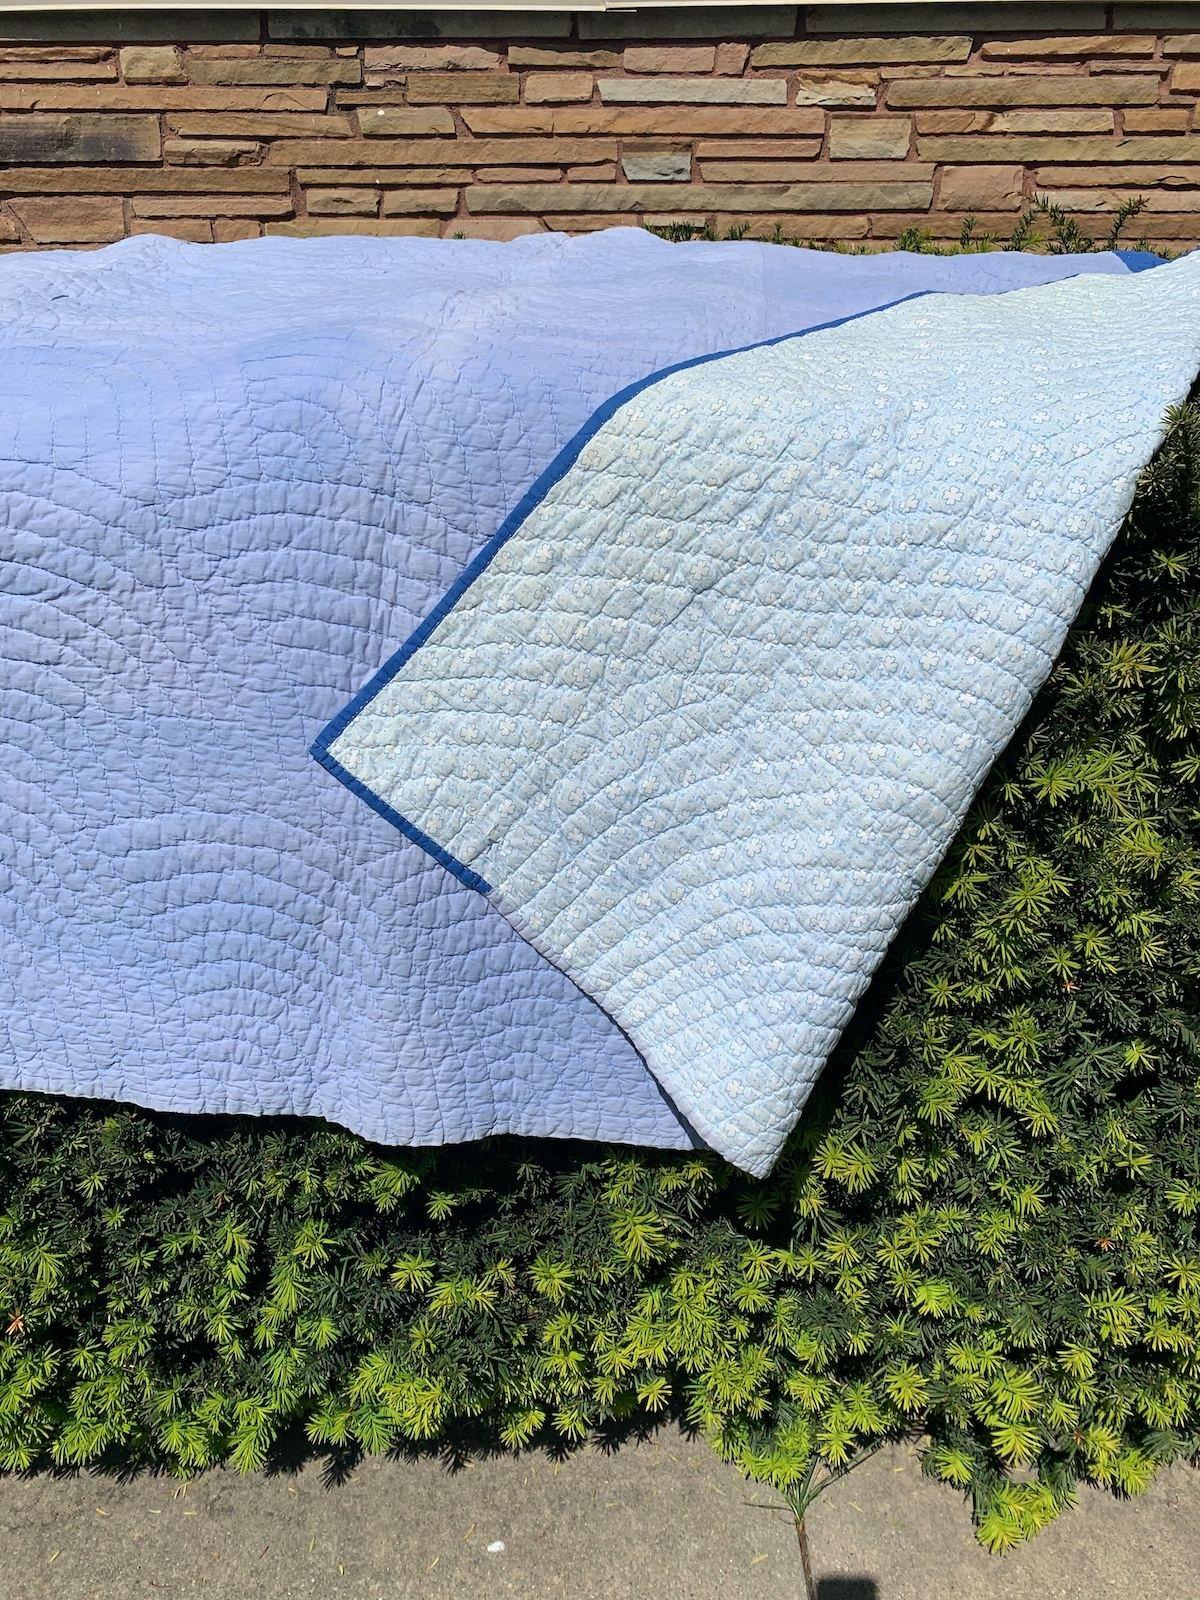 7-quilt with corner folded on bush